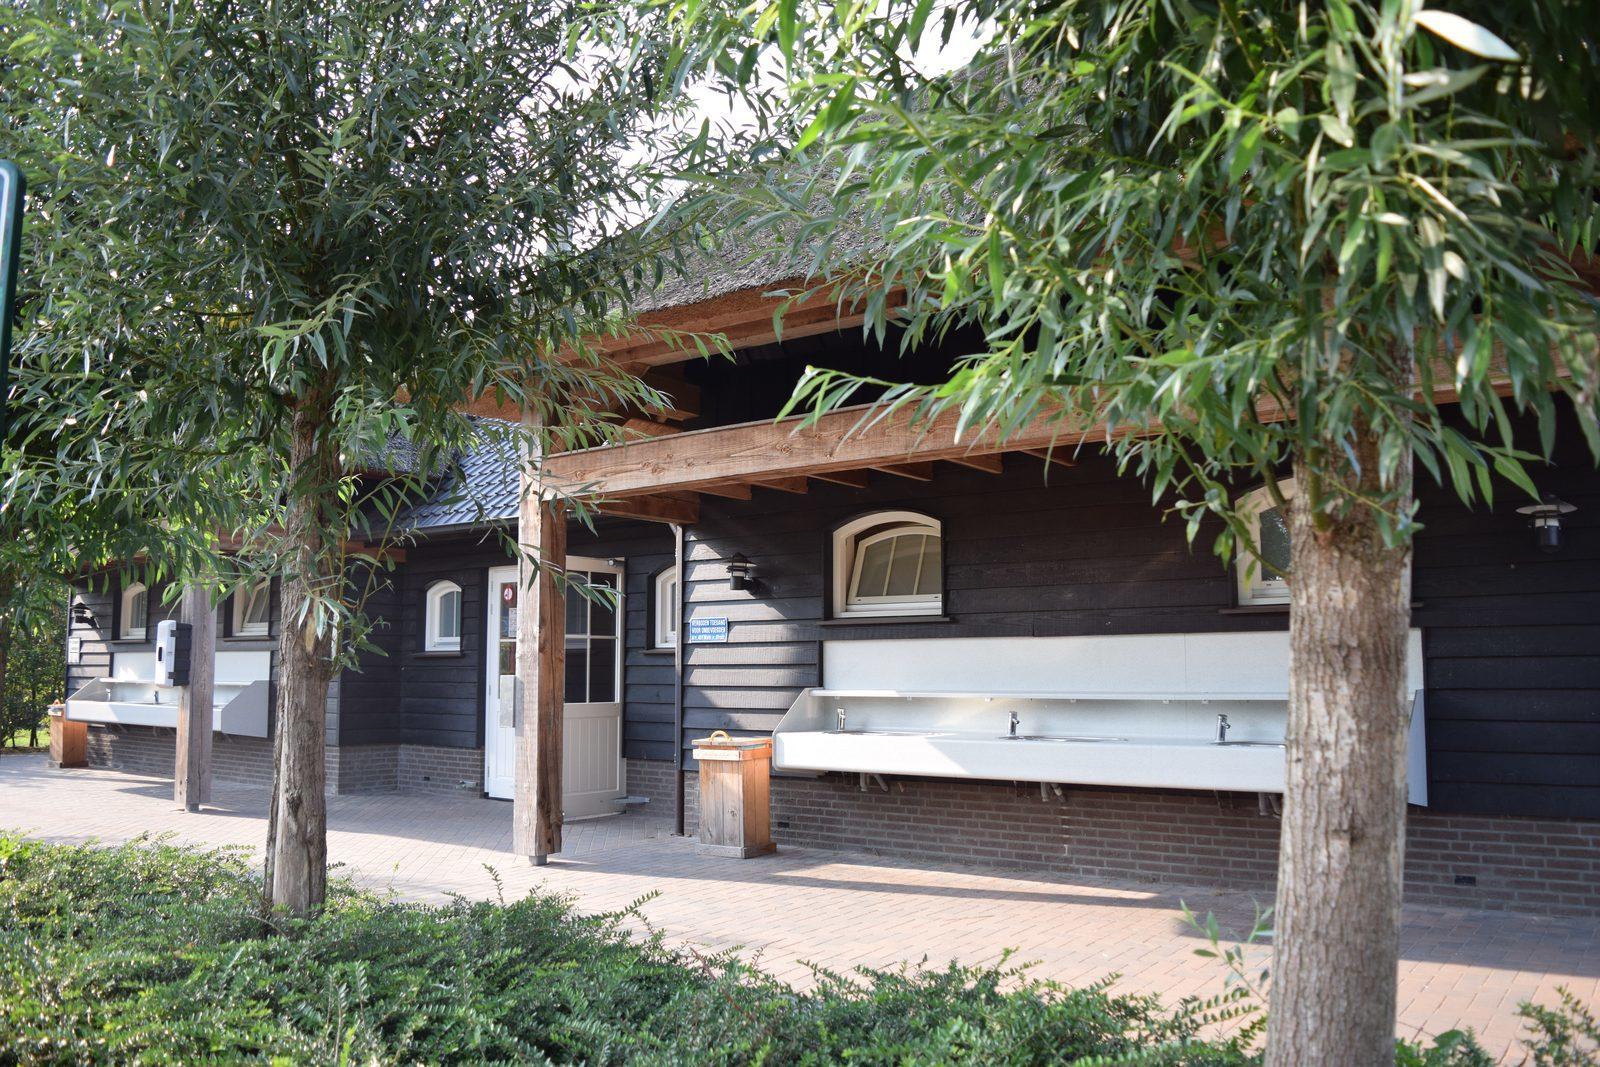 Facilities at De Boshoek